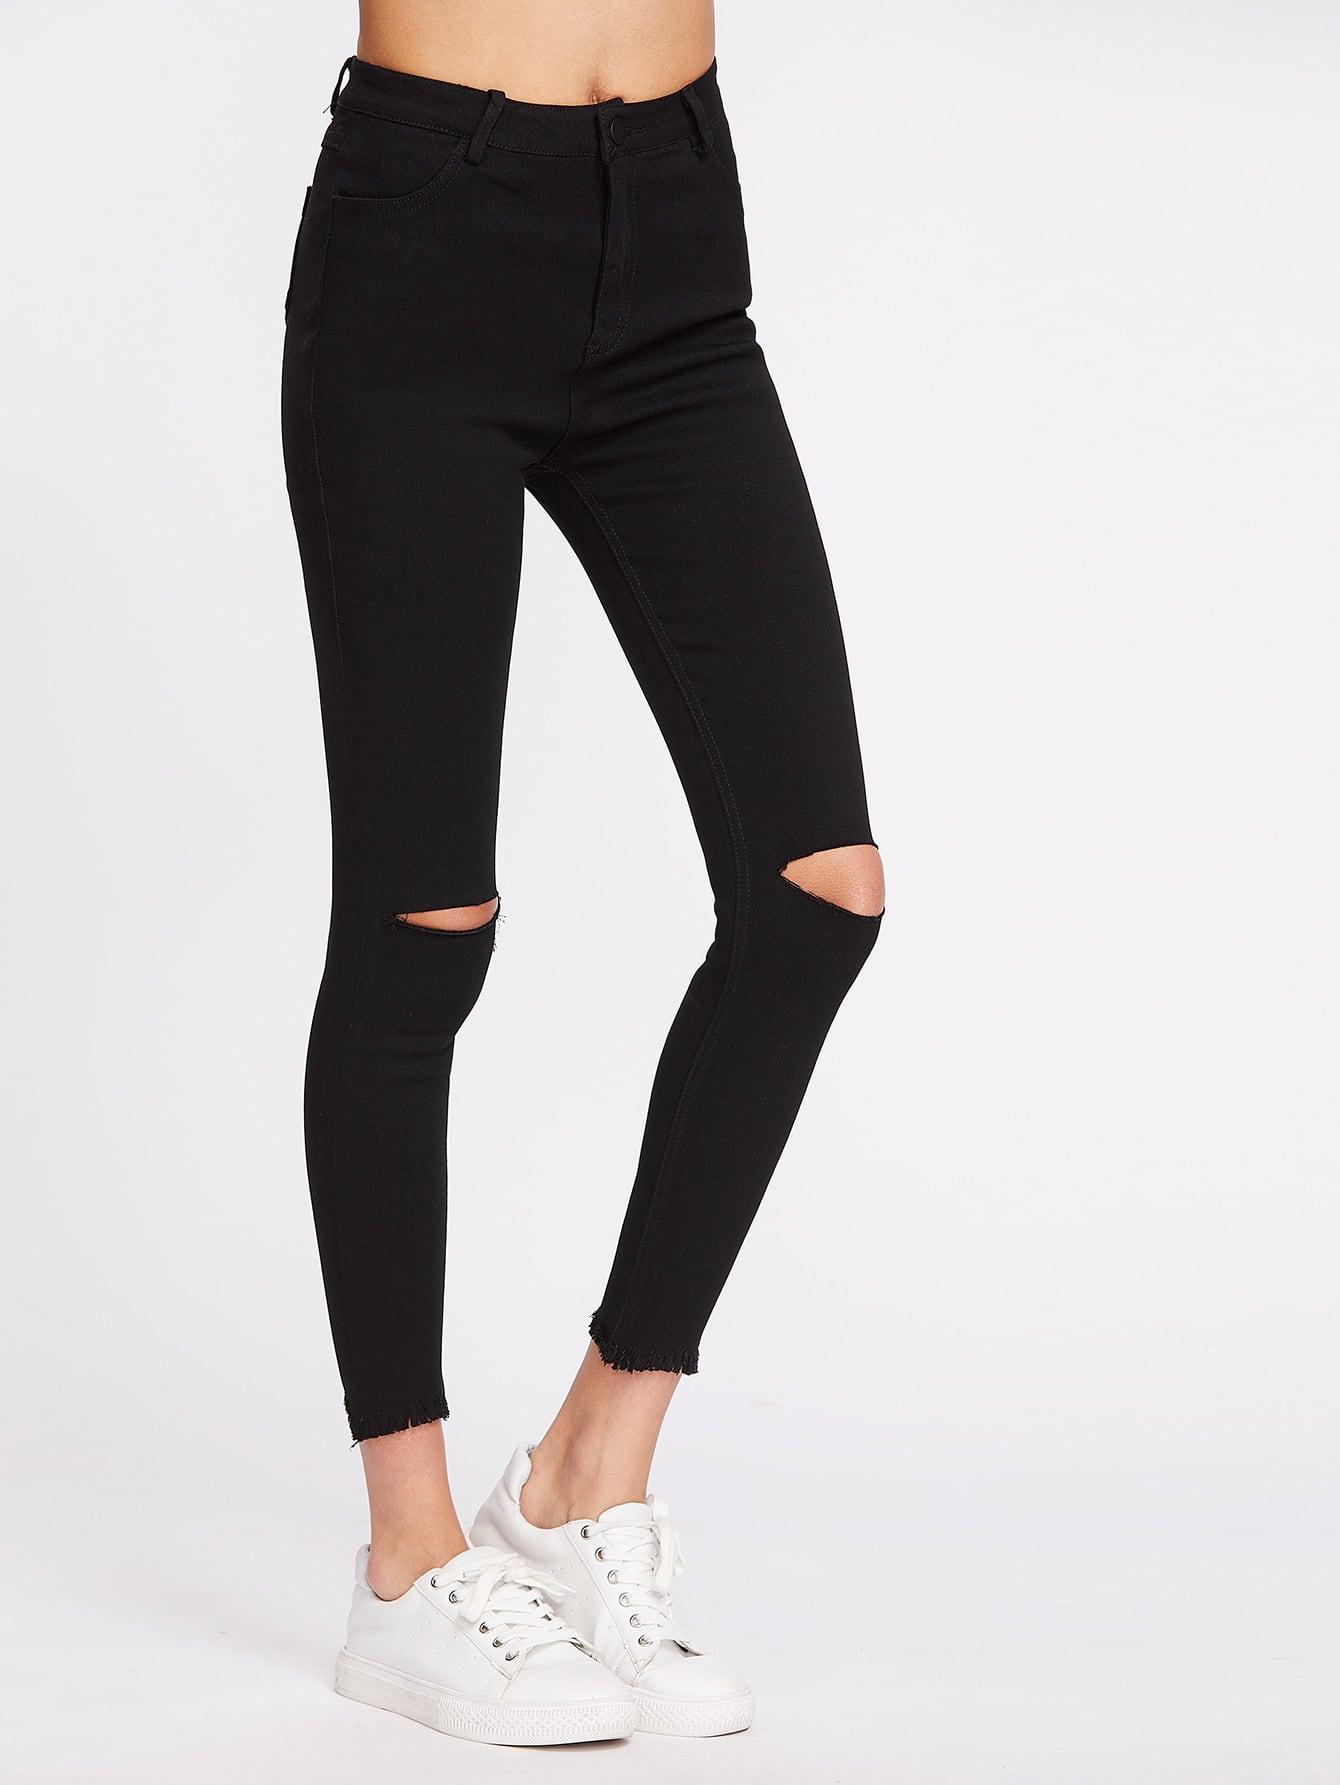 http://it.shein.com/Knee-Cut-Frayed-Hem-Skinny-Jeans-p-355439-cat-1740.html